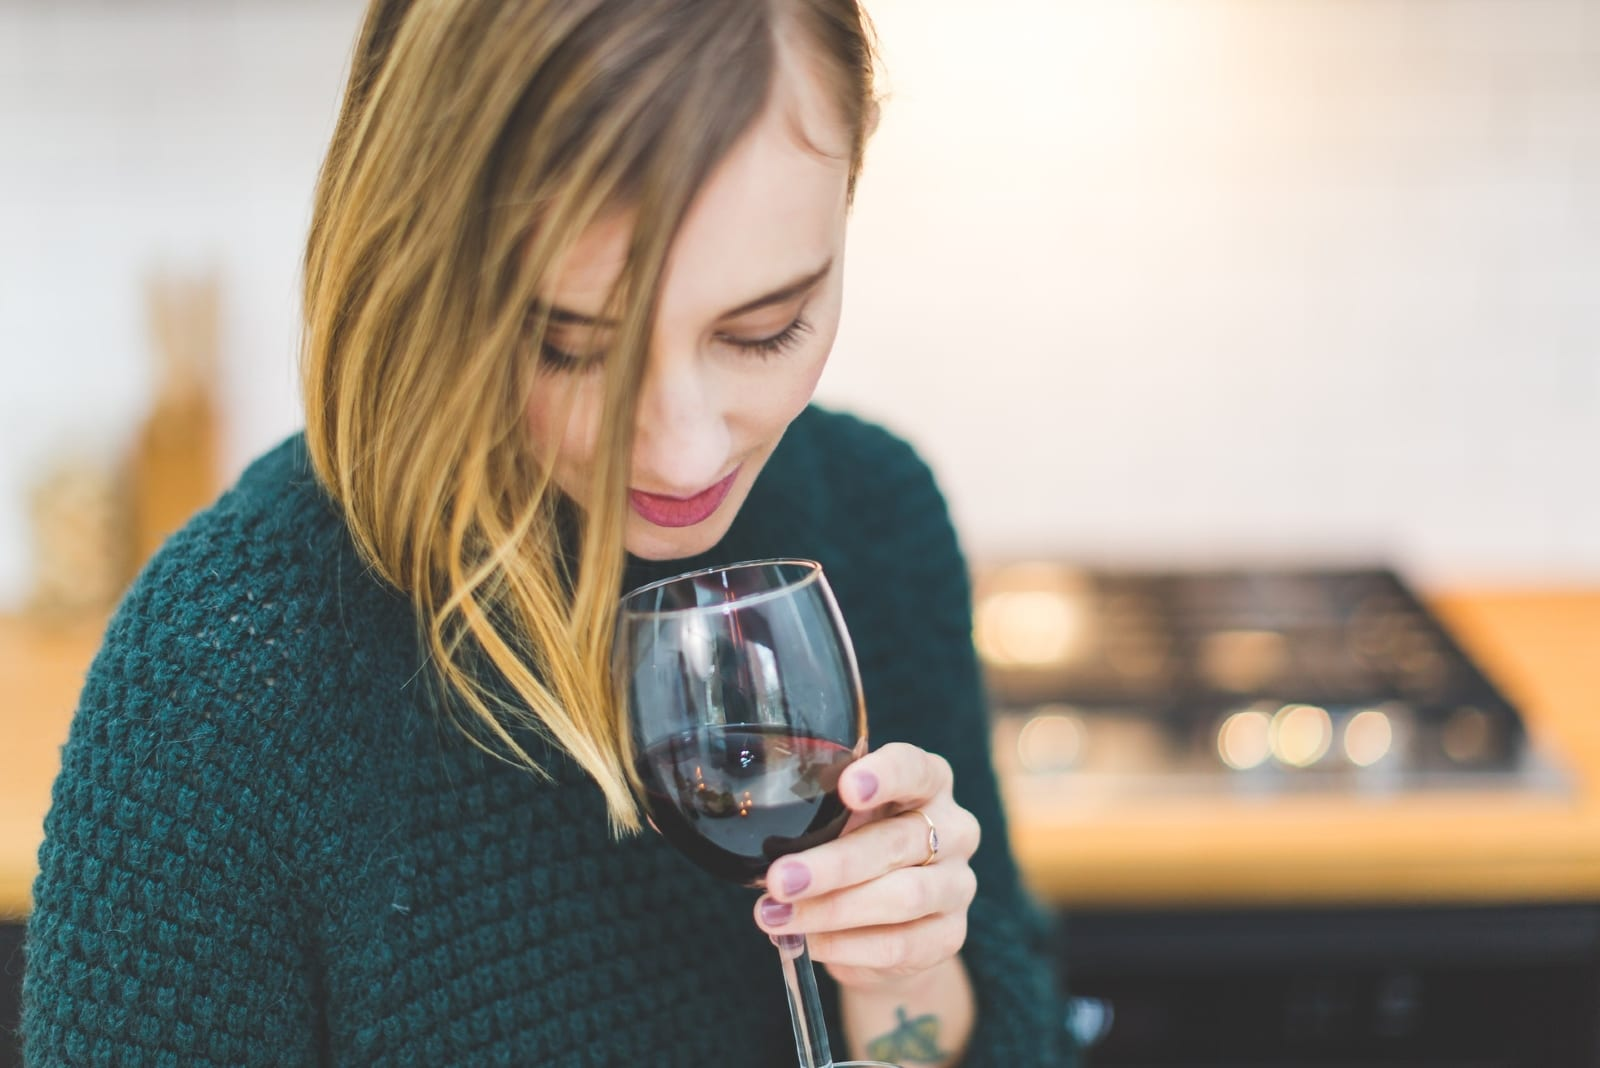 woman in green sweater drinking wine